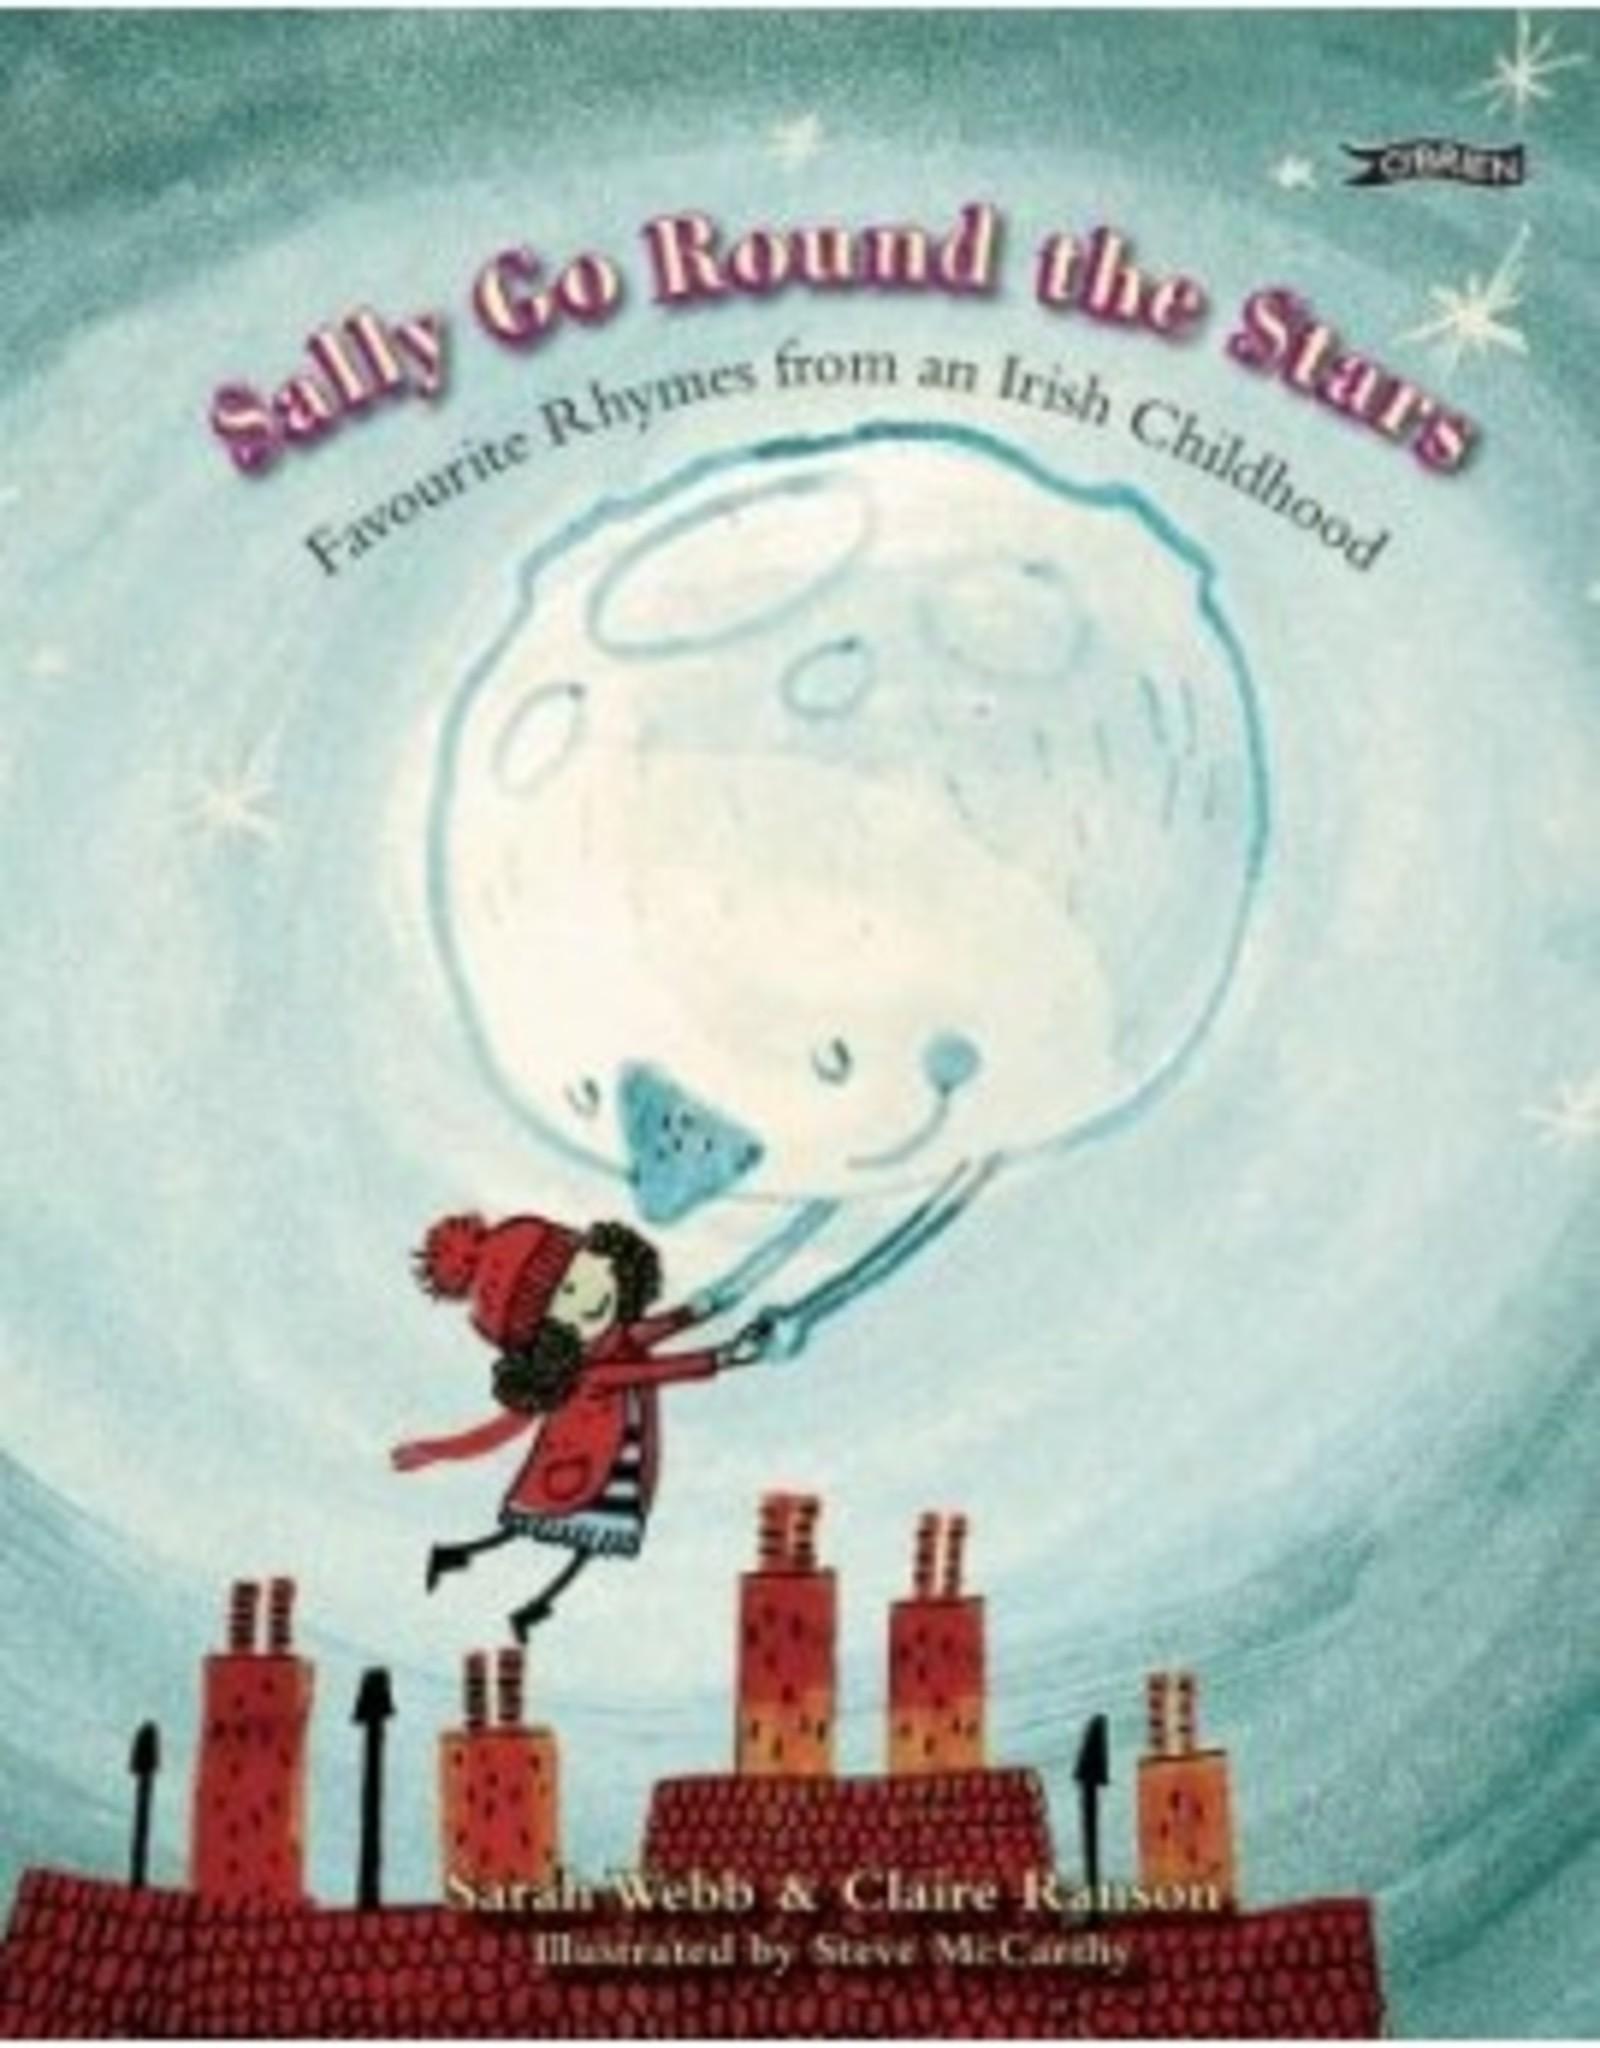 Sally go round the stars